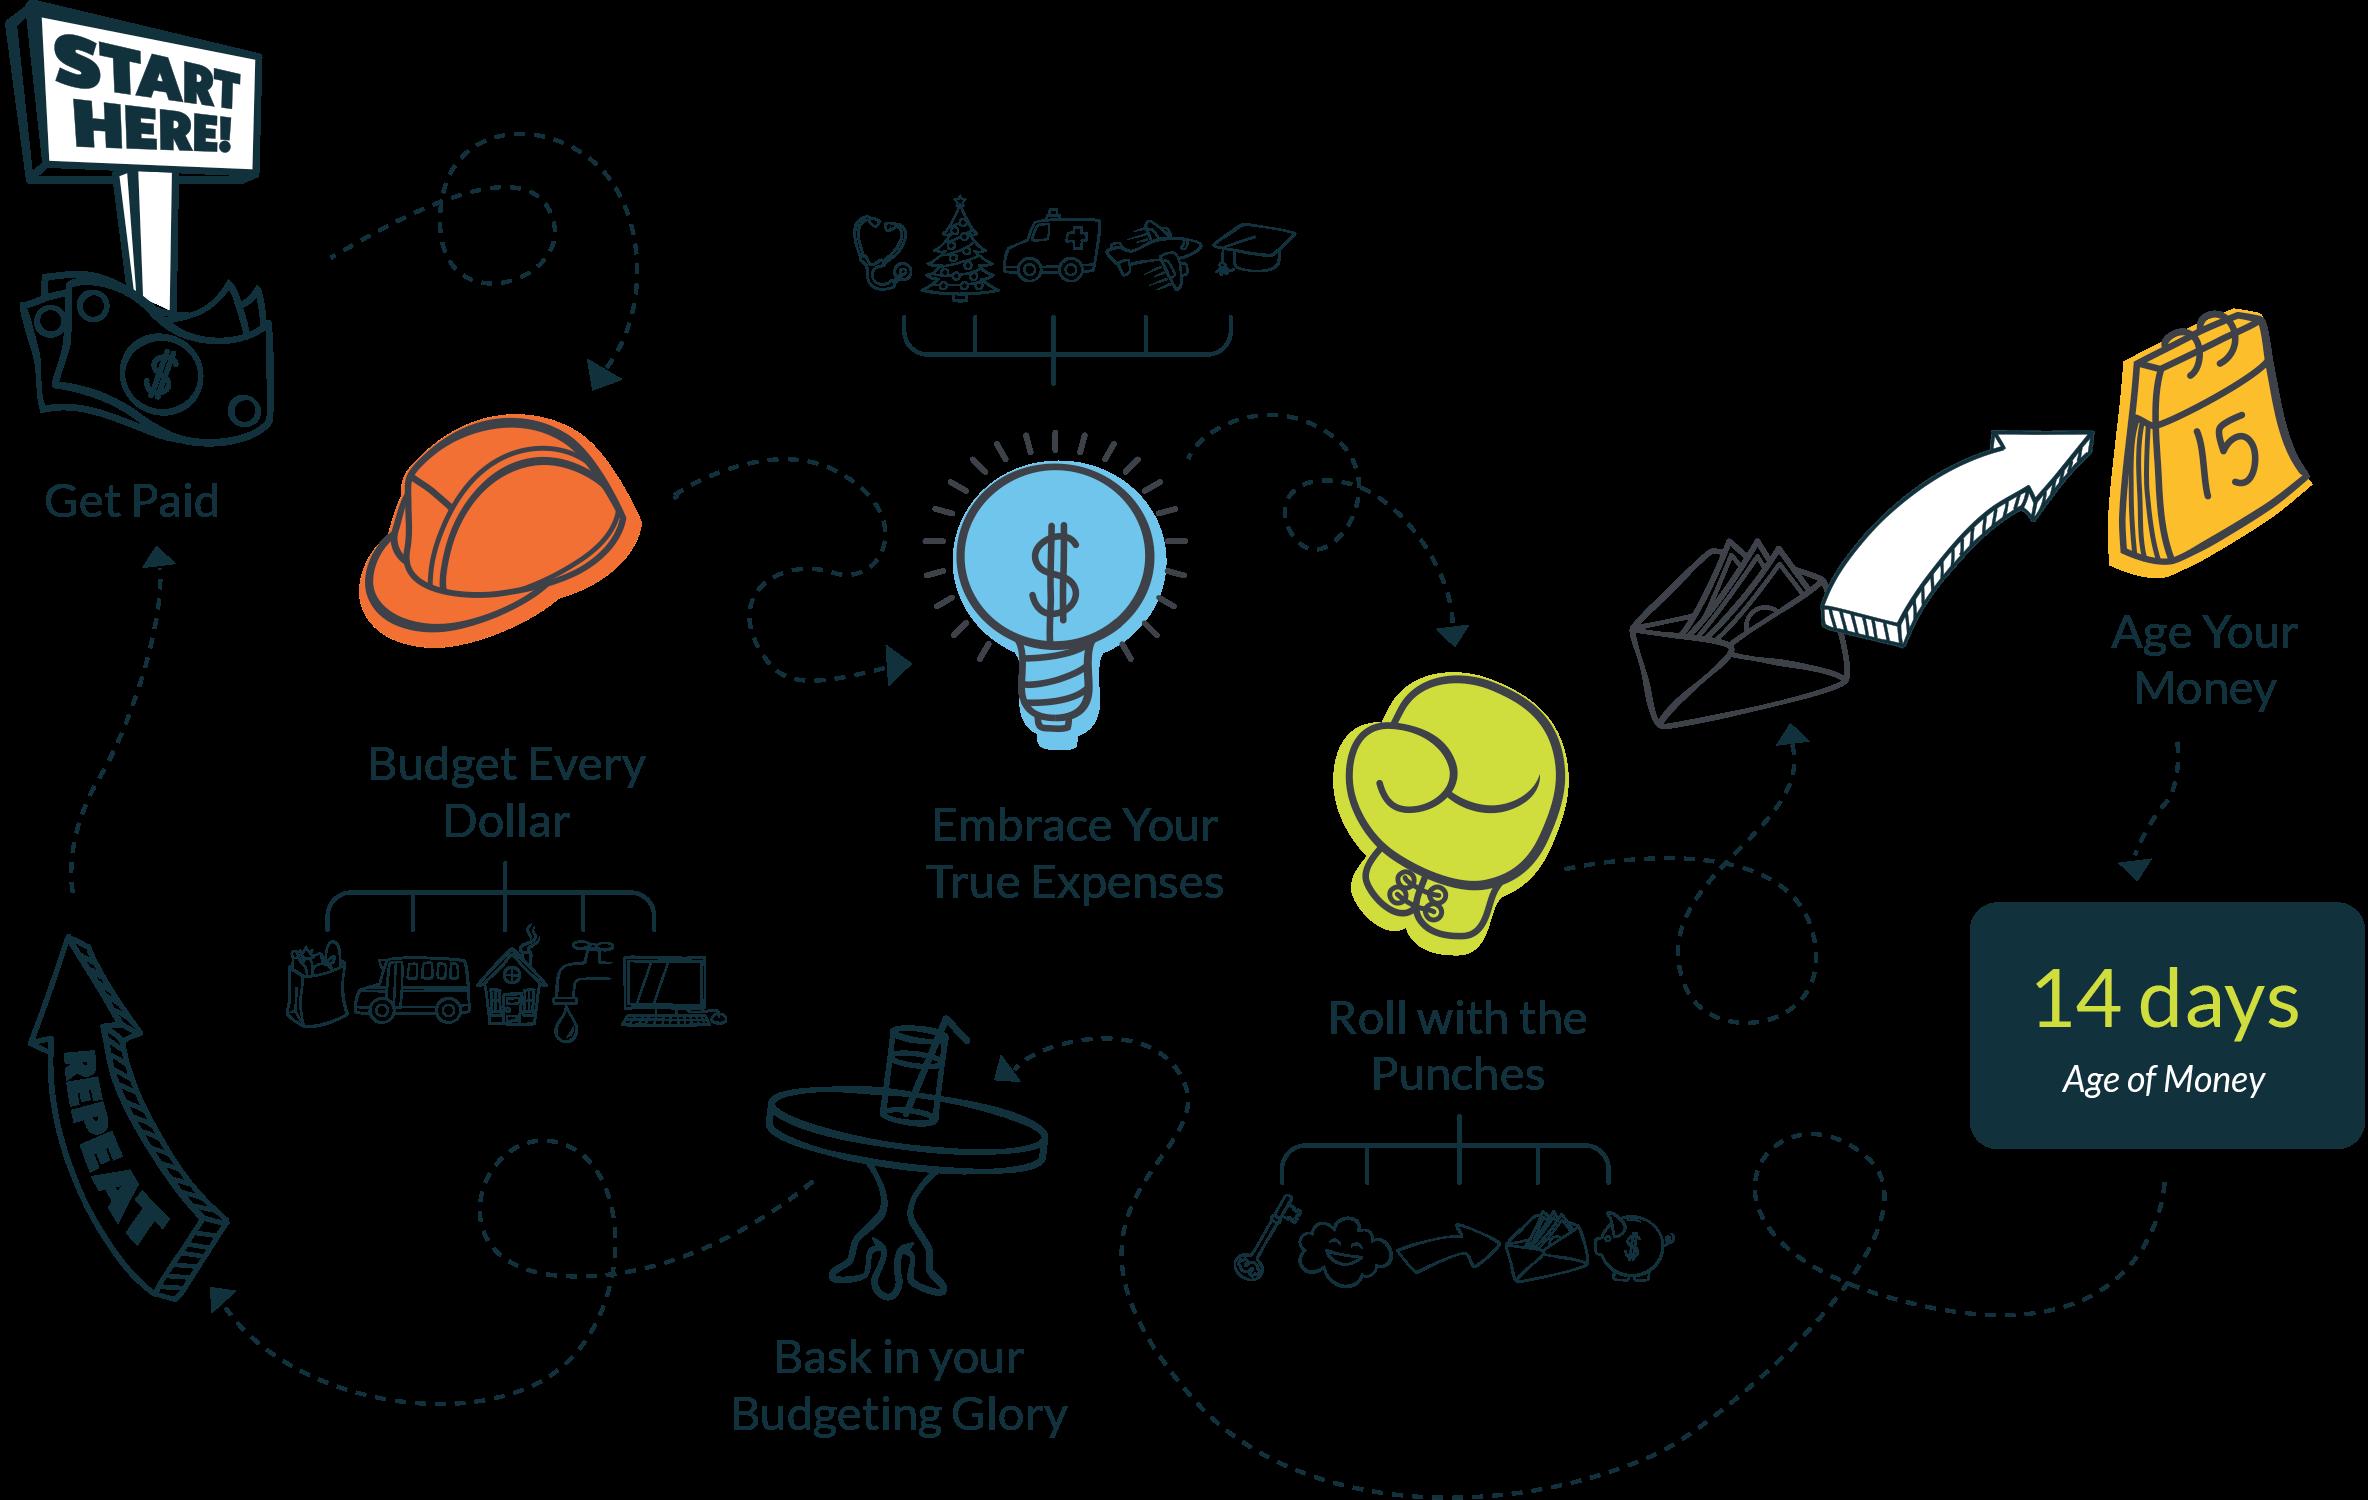 YNAB Infographic